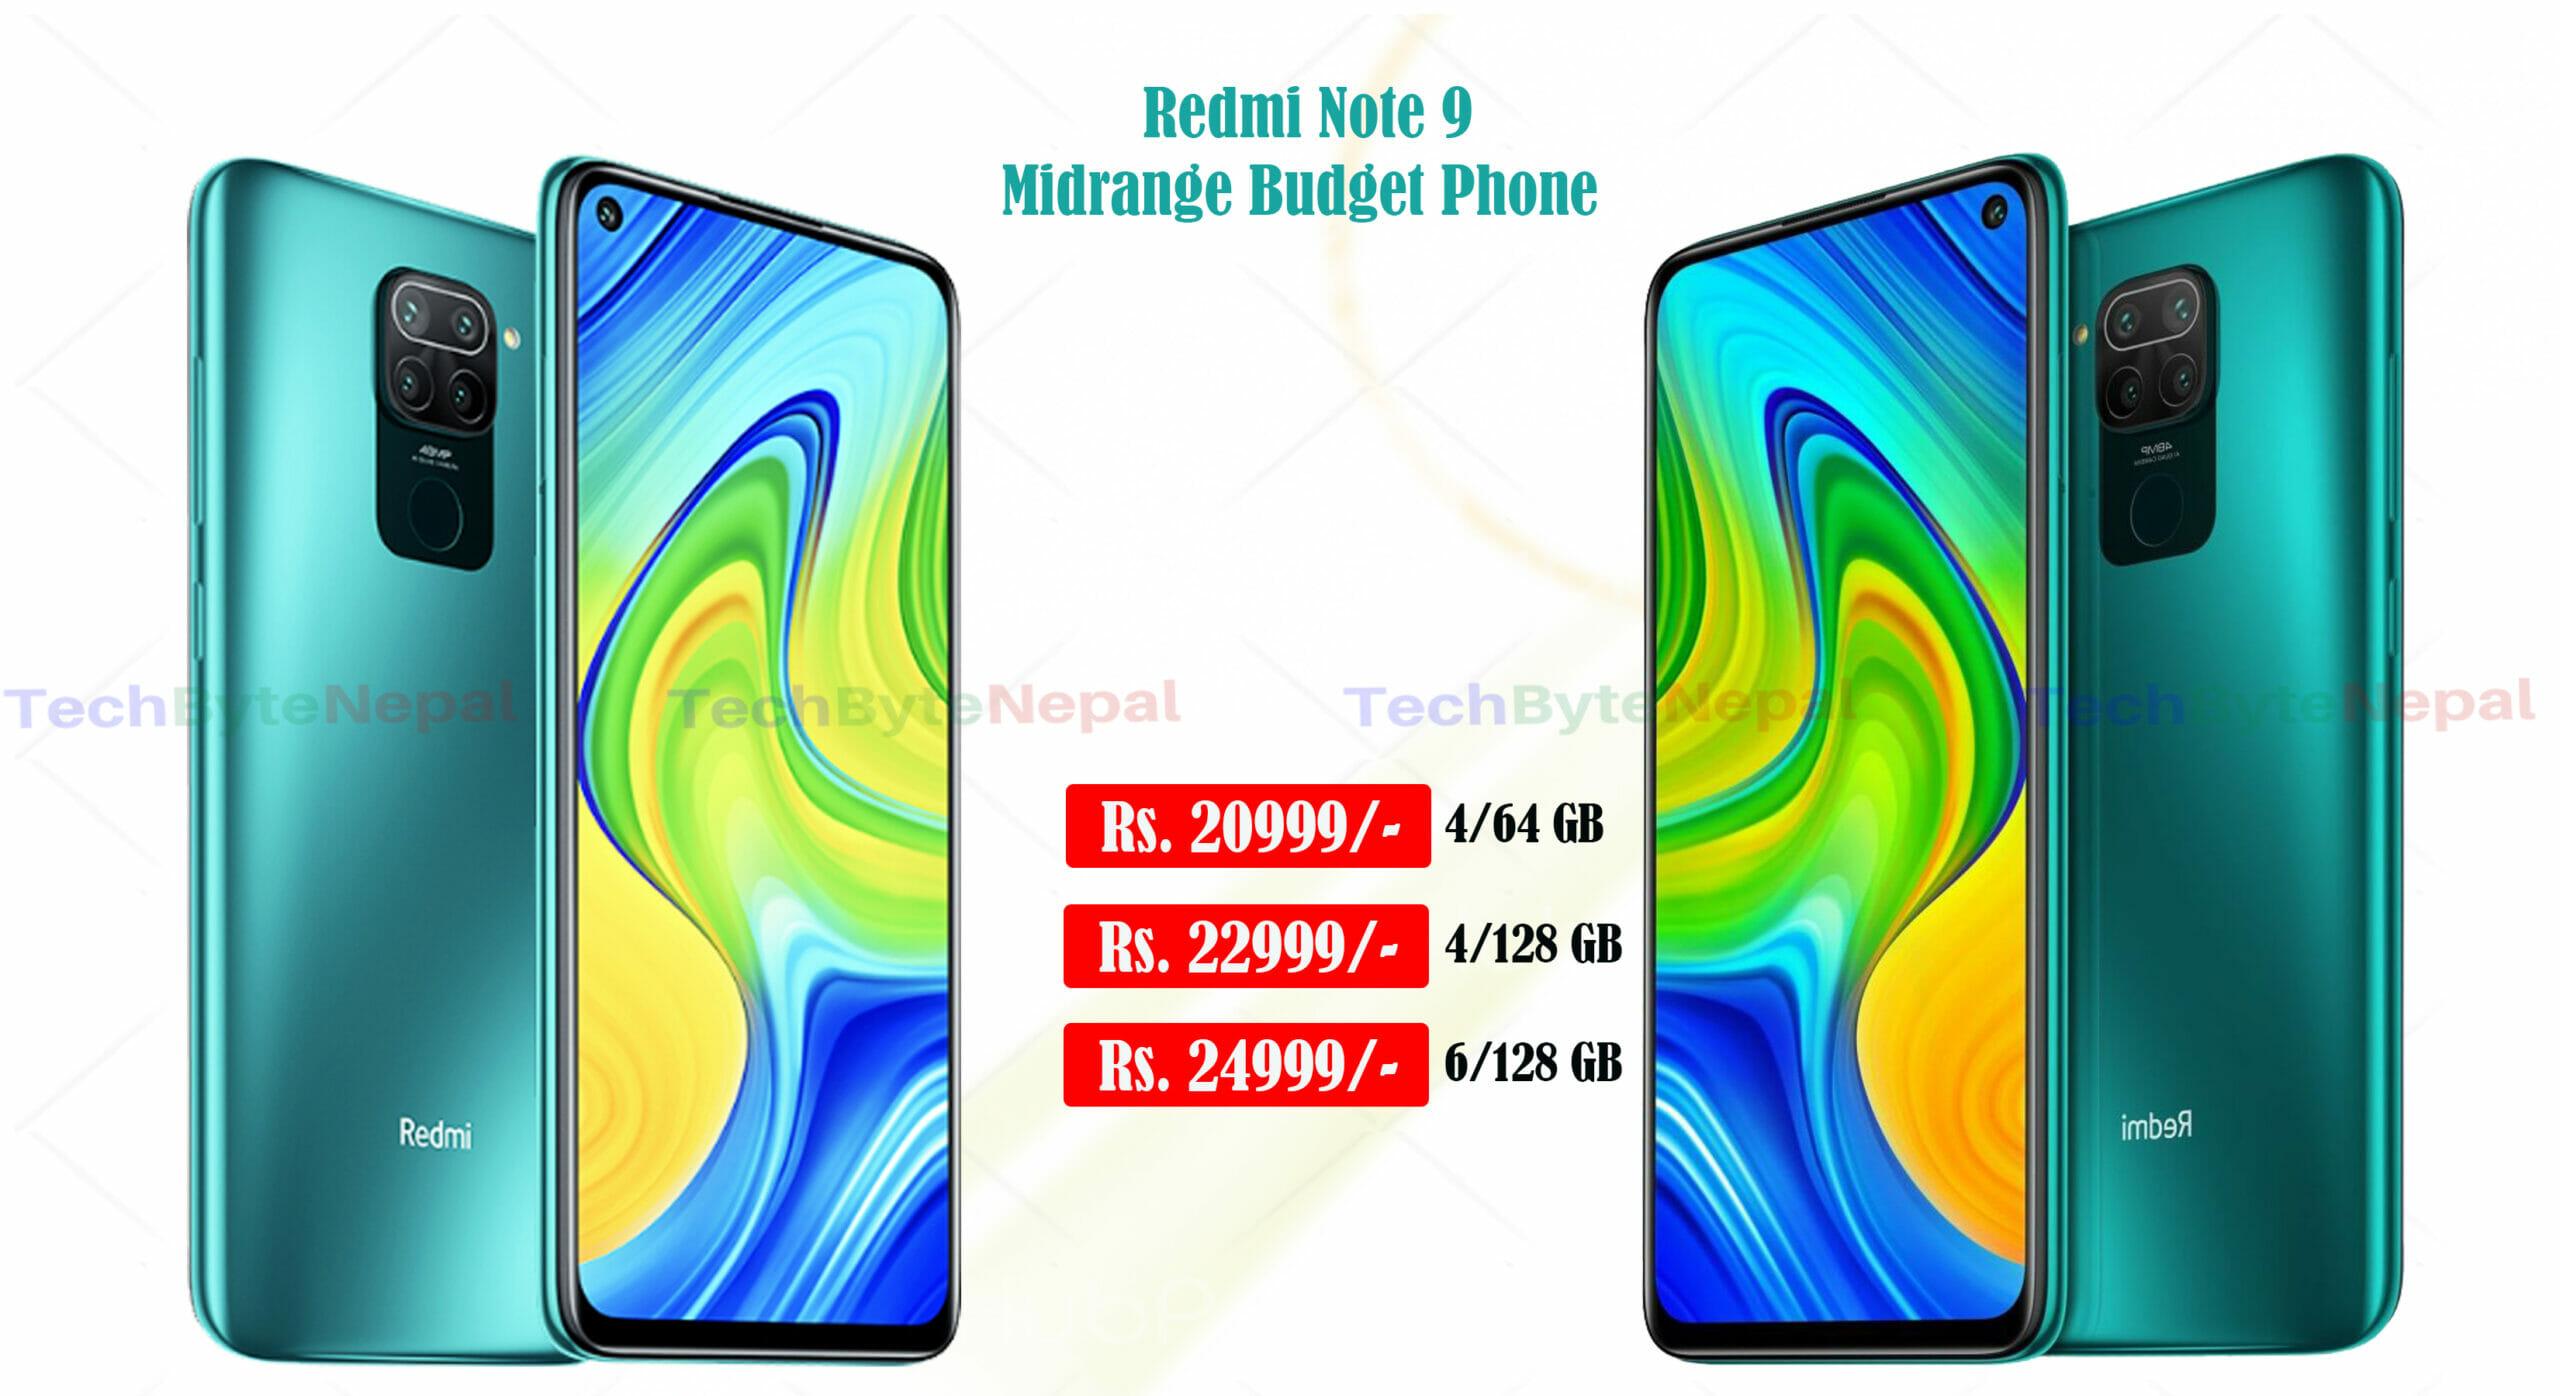 Redmi Note 9 is midrange budget phone